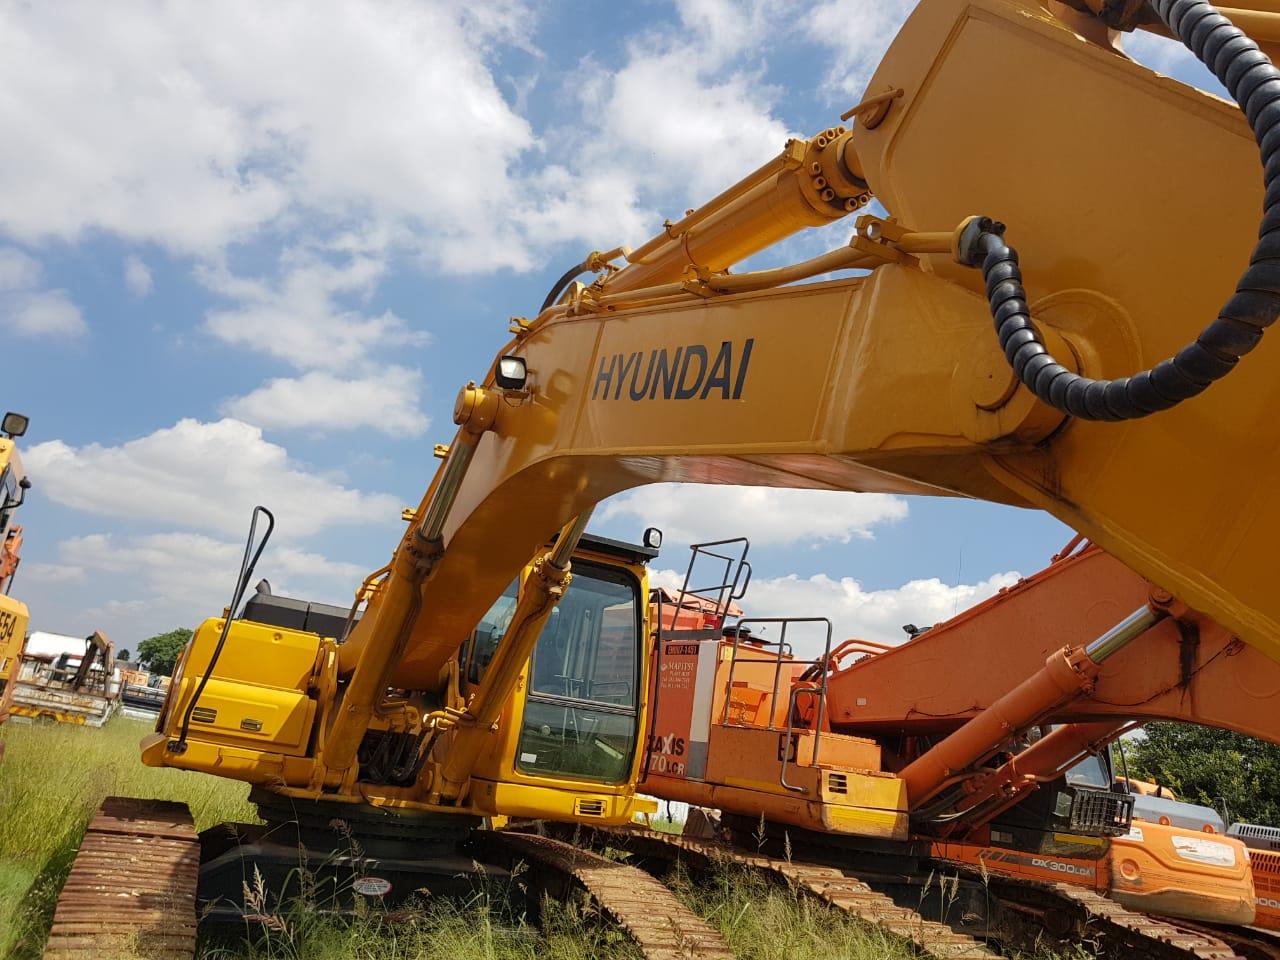 Hyunadai 500LC-7A excavator